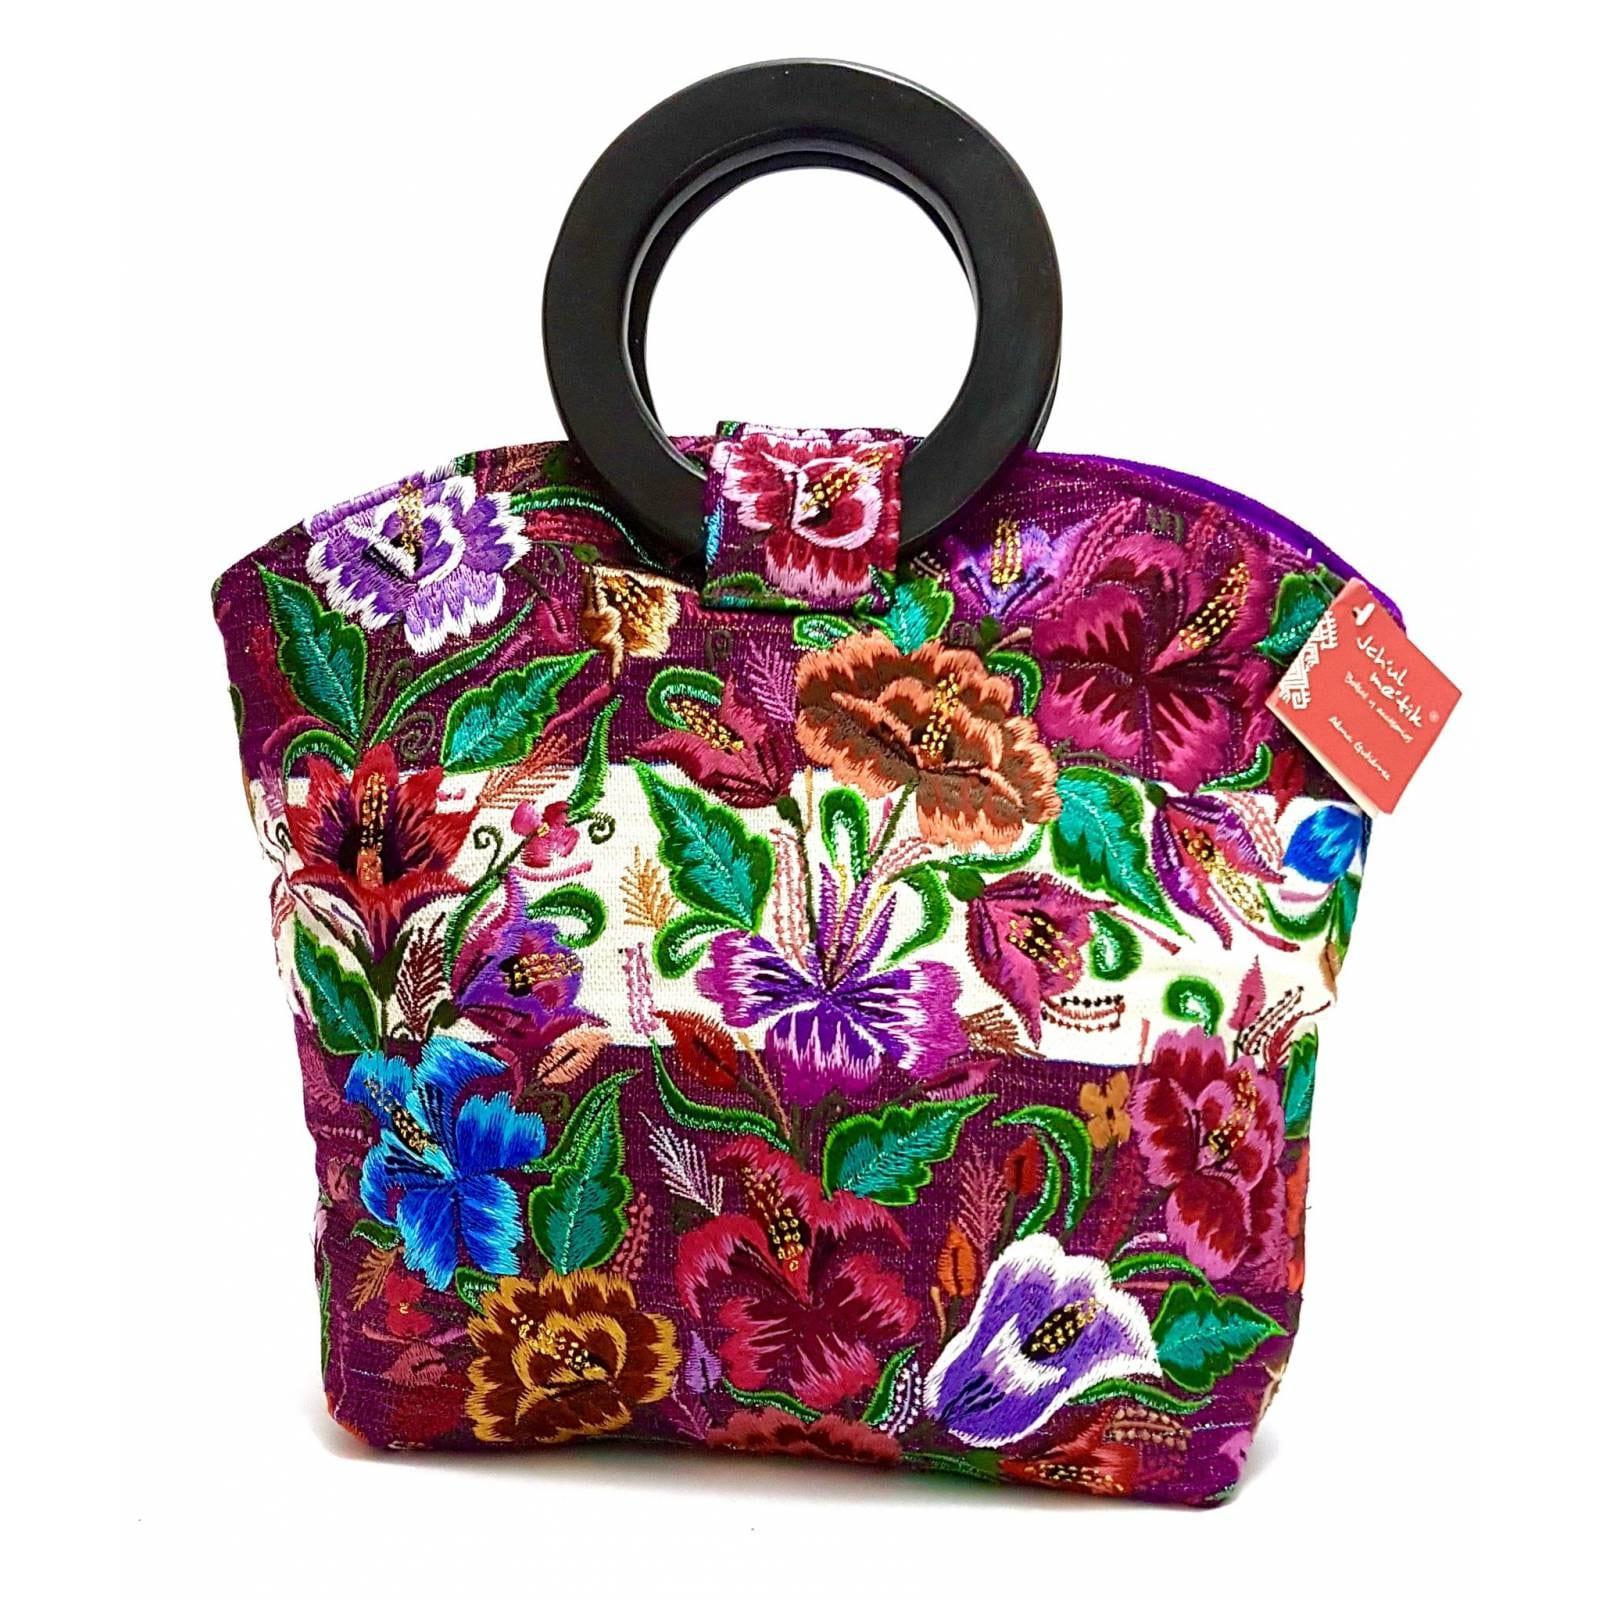 Bolsa De Diseñadora Mexicana Con Bordado Artesanal Chiapanenco Jchul metik Modelo Tenam Flores Lilas